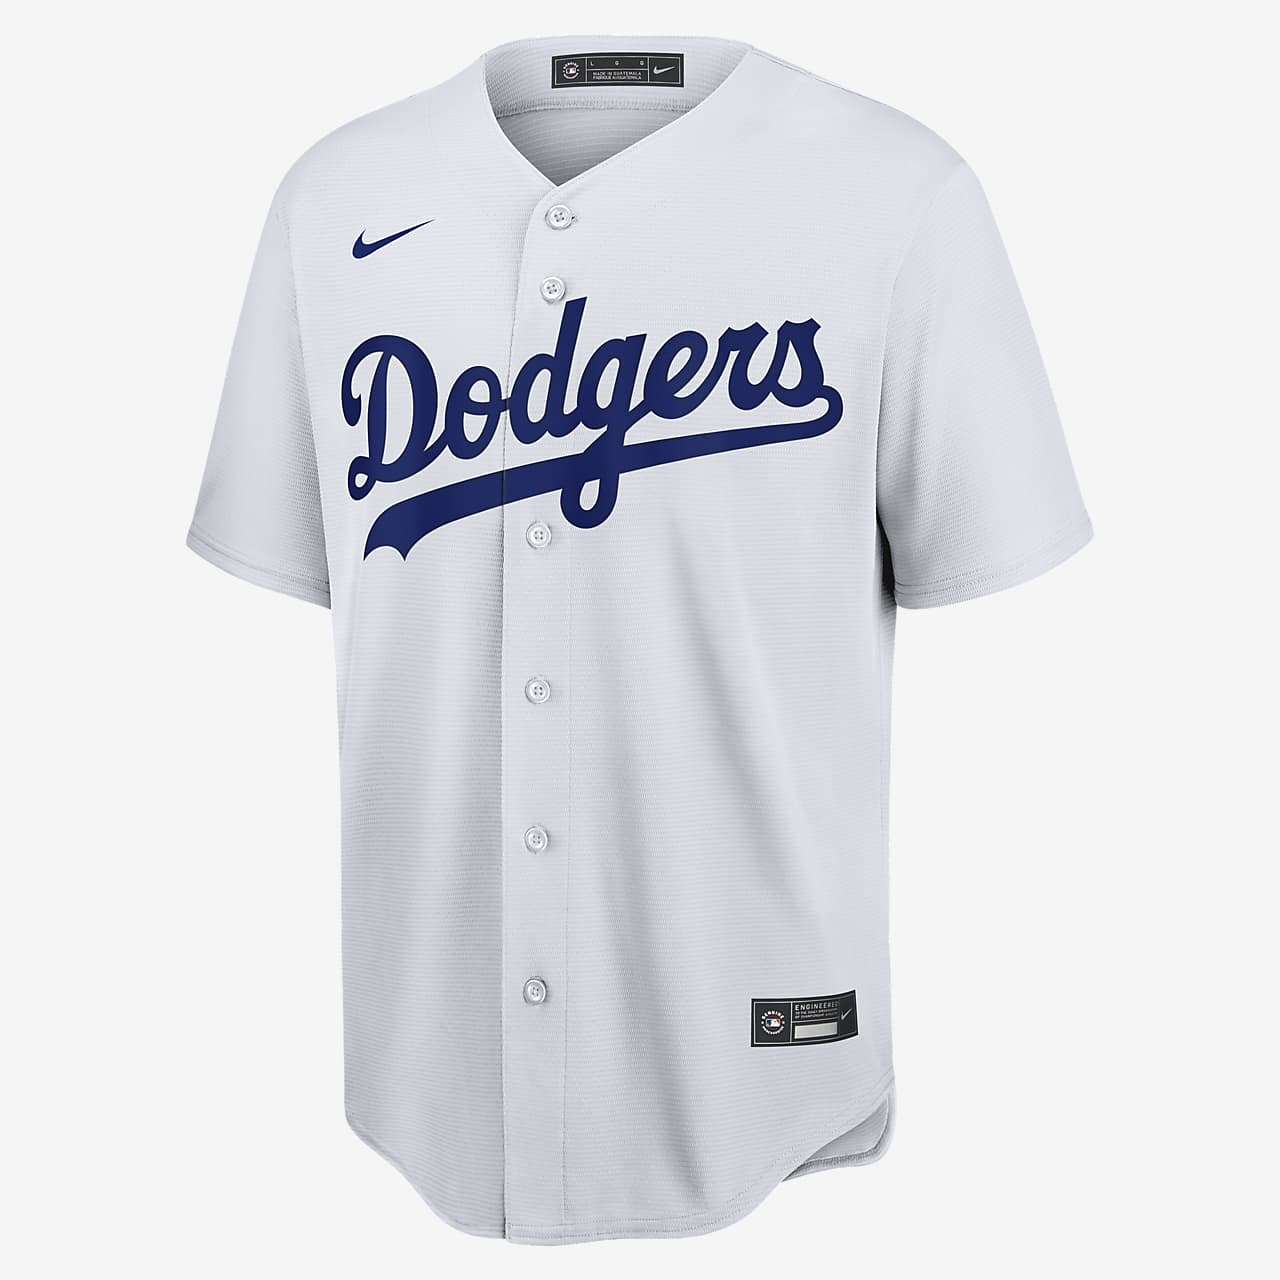 MLB Los Angeles Dodgers (Clayton Kershaw) Men's Replica Baseball Jersey